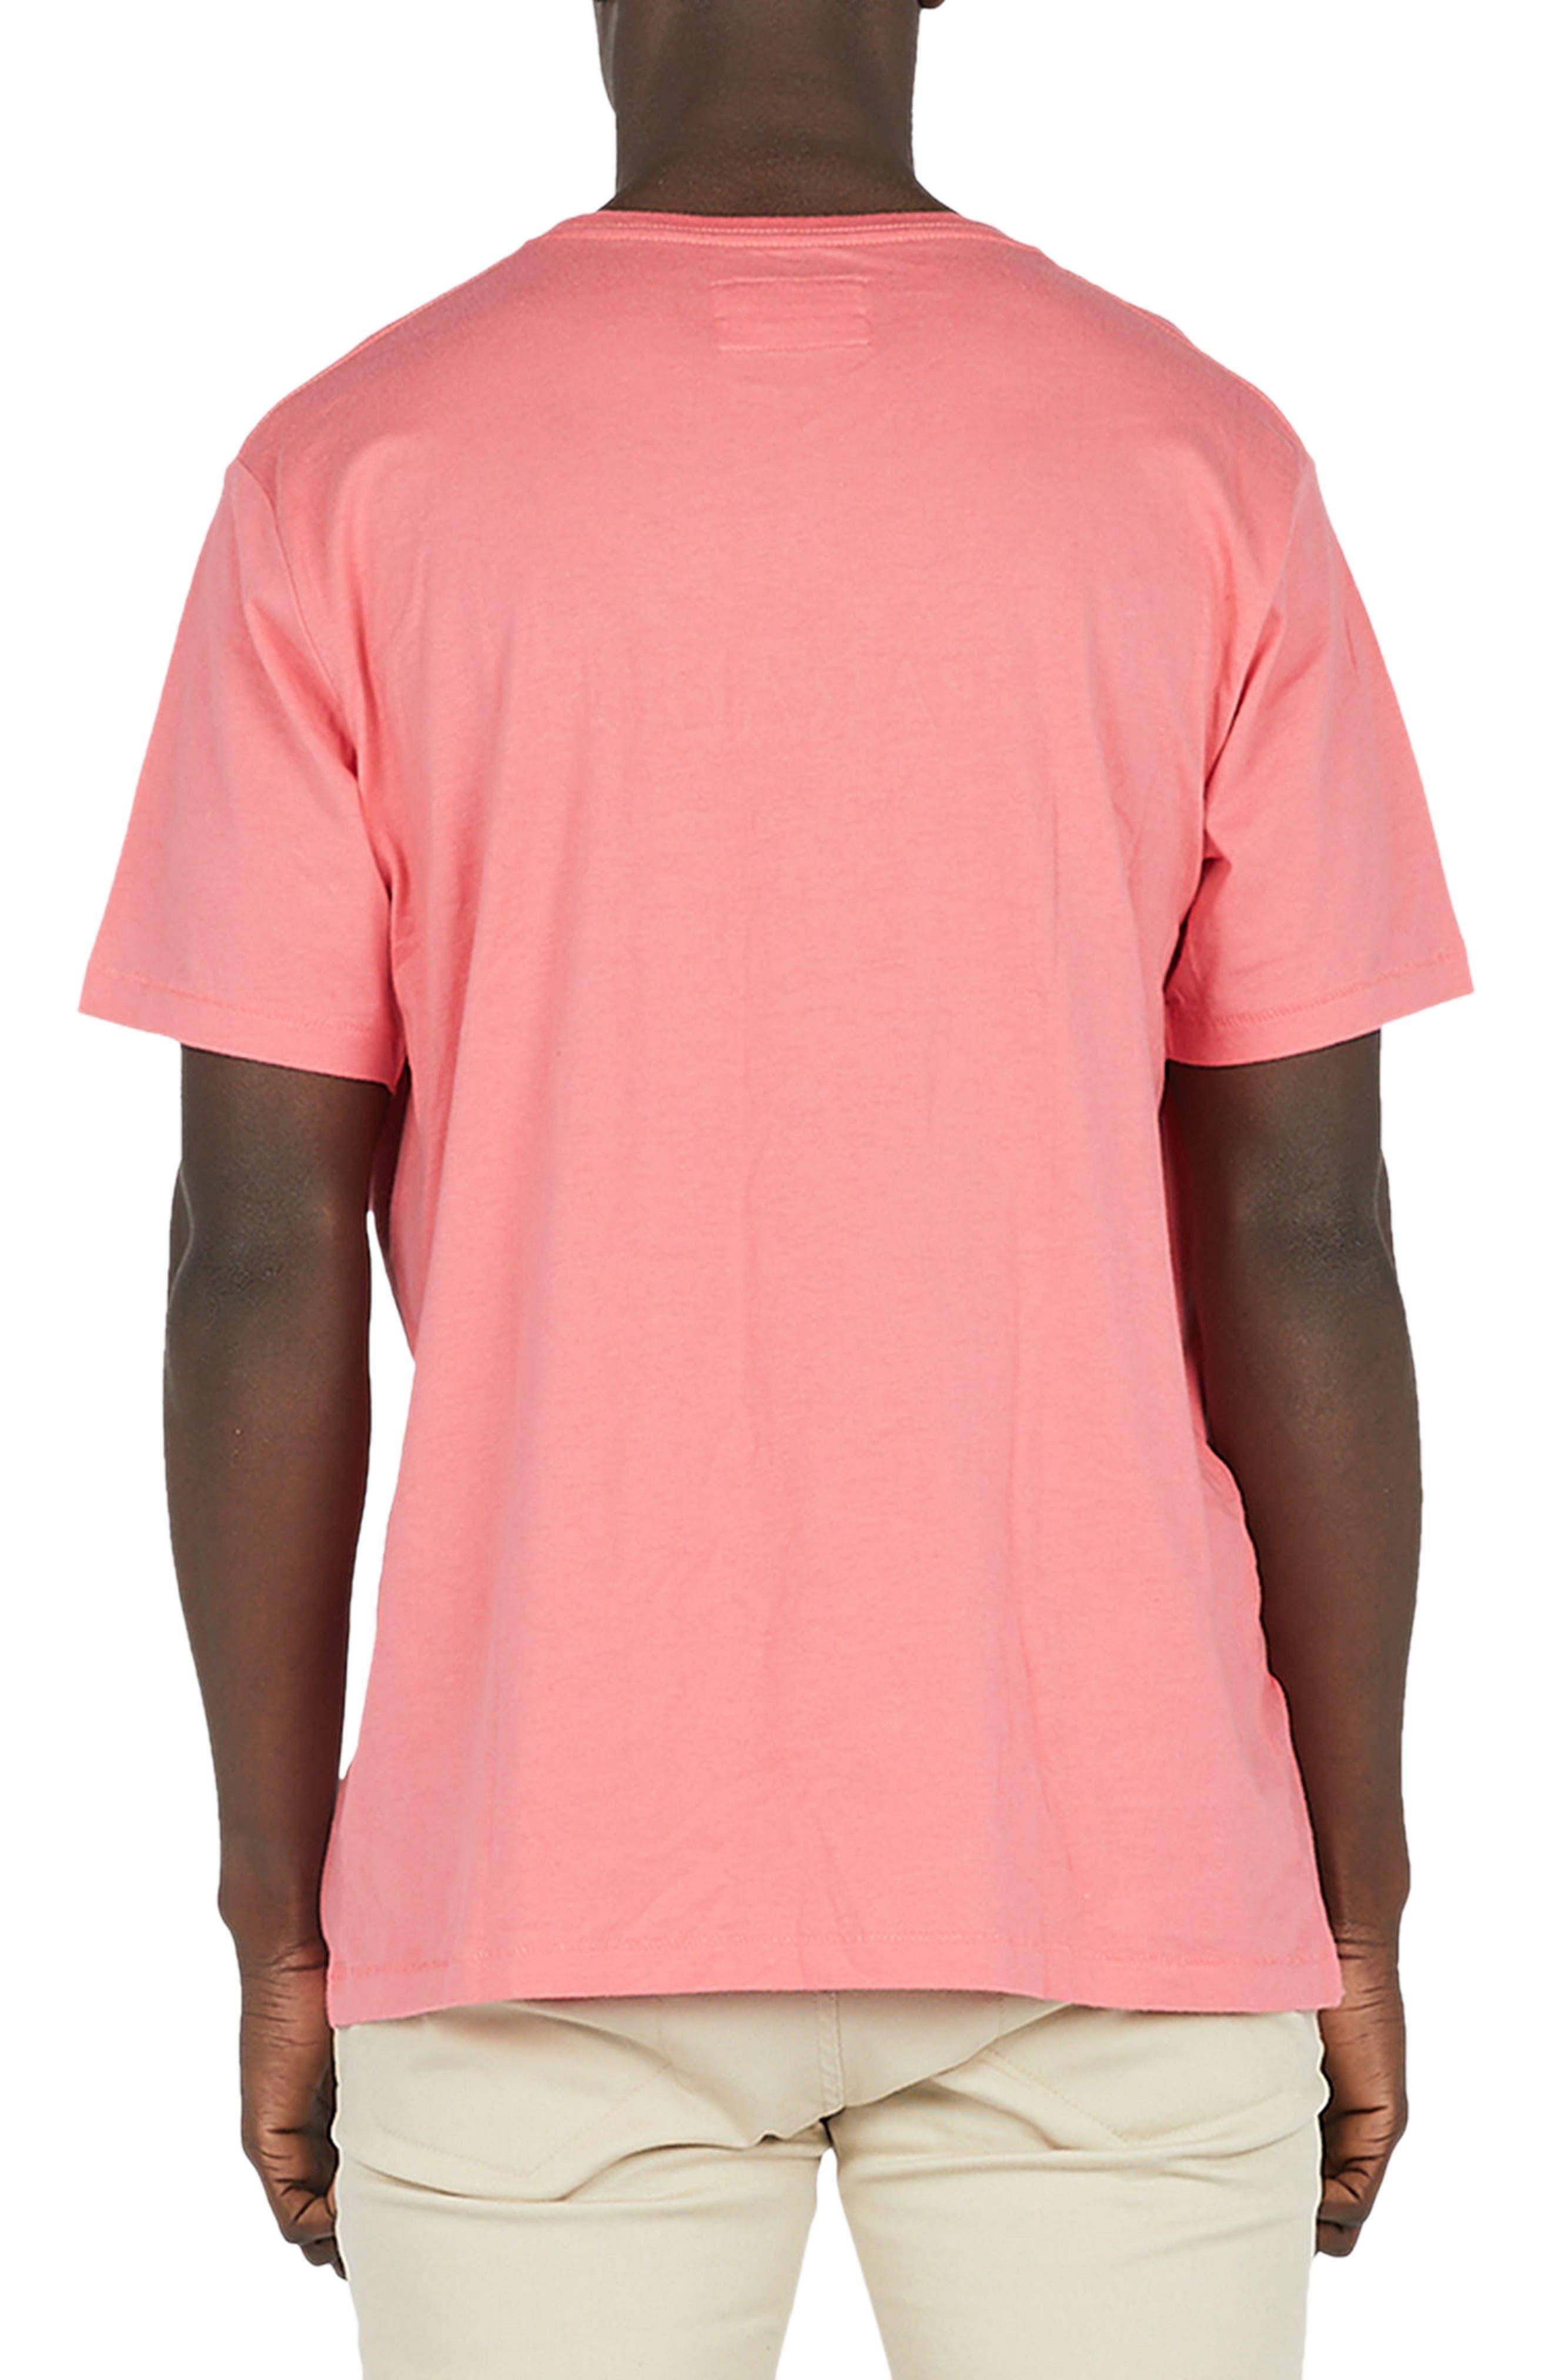 Paradise T-Shirt,                             Alternate thumbnail 2, color,                             Coral Pink